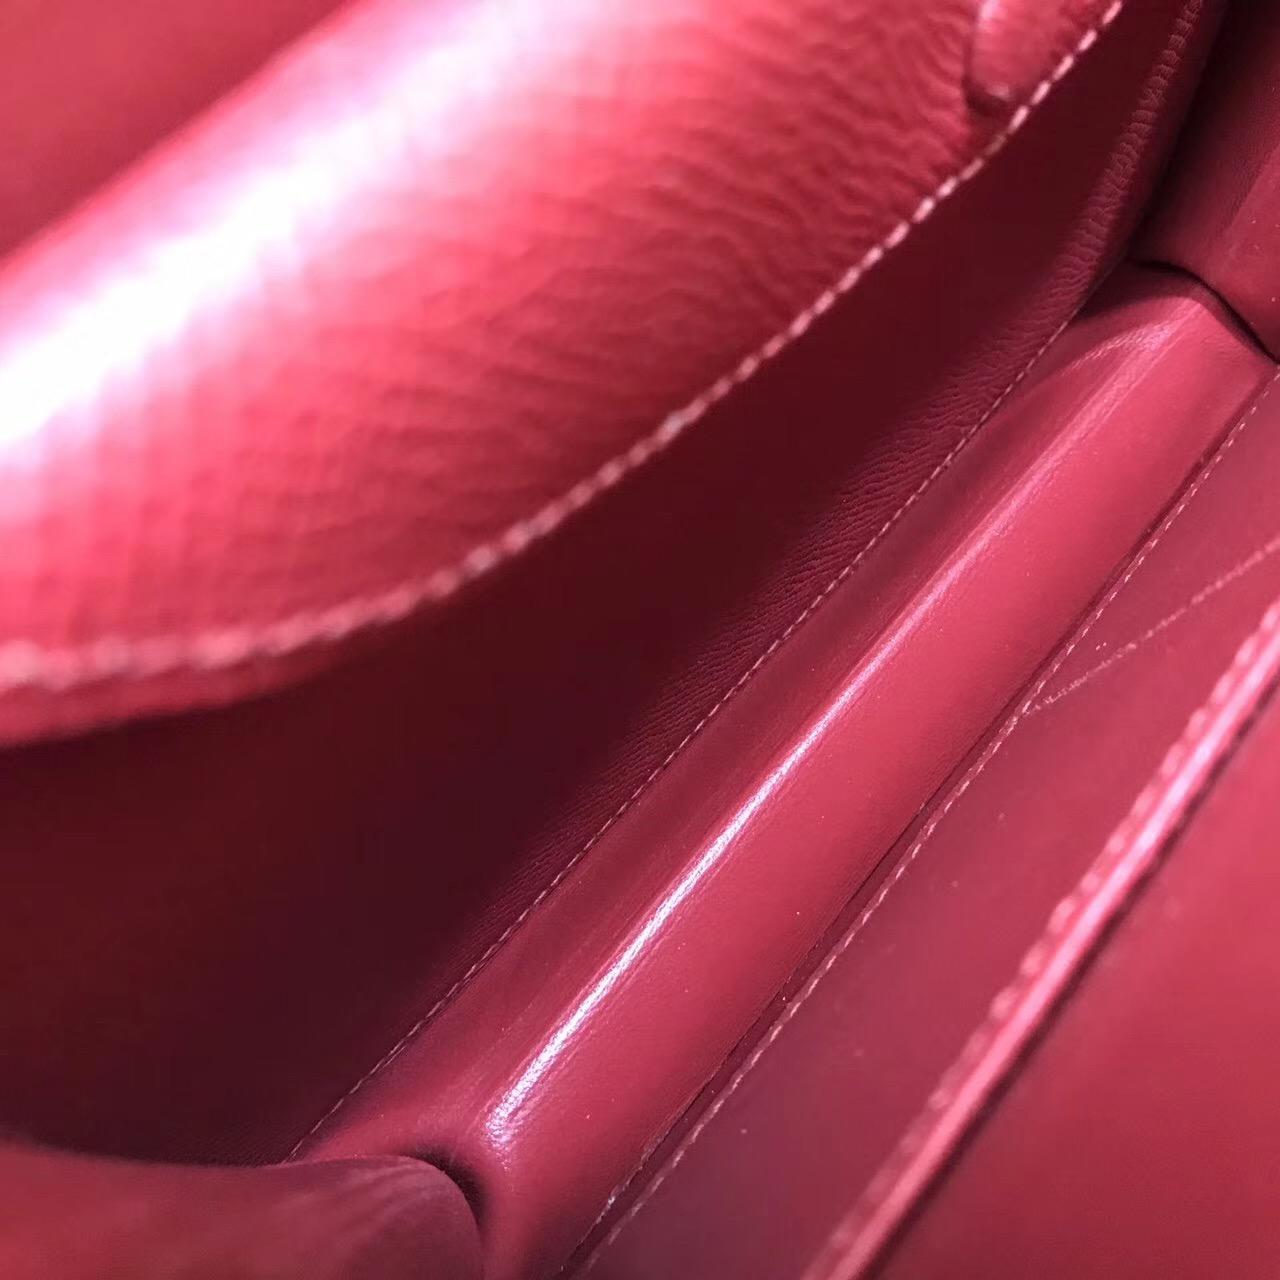 Verrou 手包 又叫手槍包插銷包Epsom K1 Rouge Grenat石榴紅 最好看的紅色